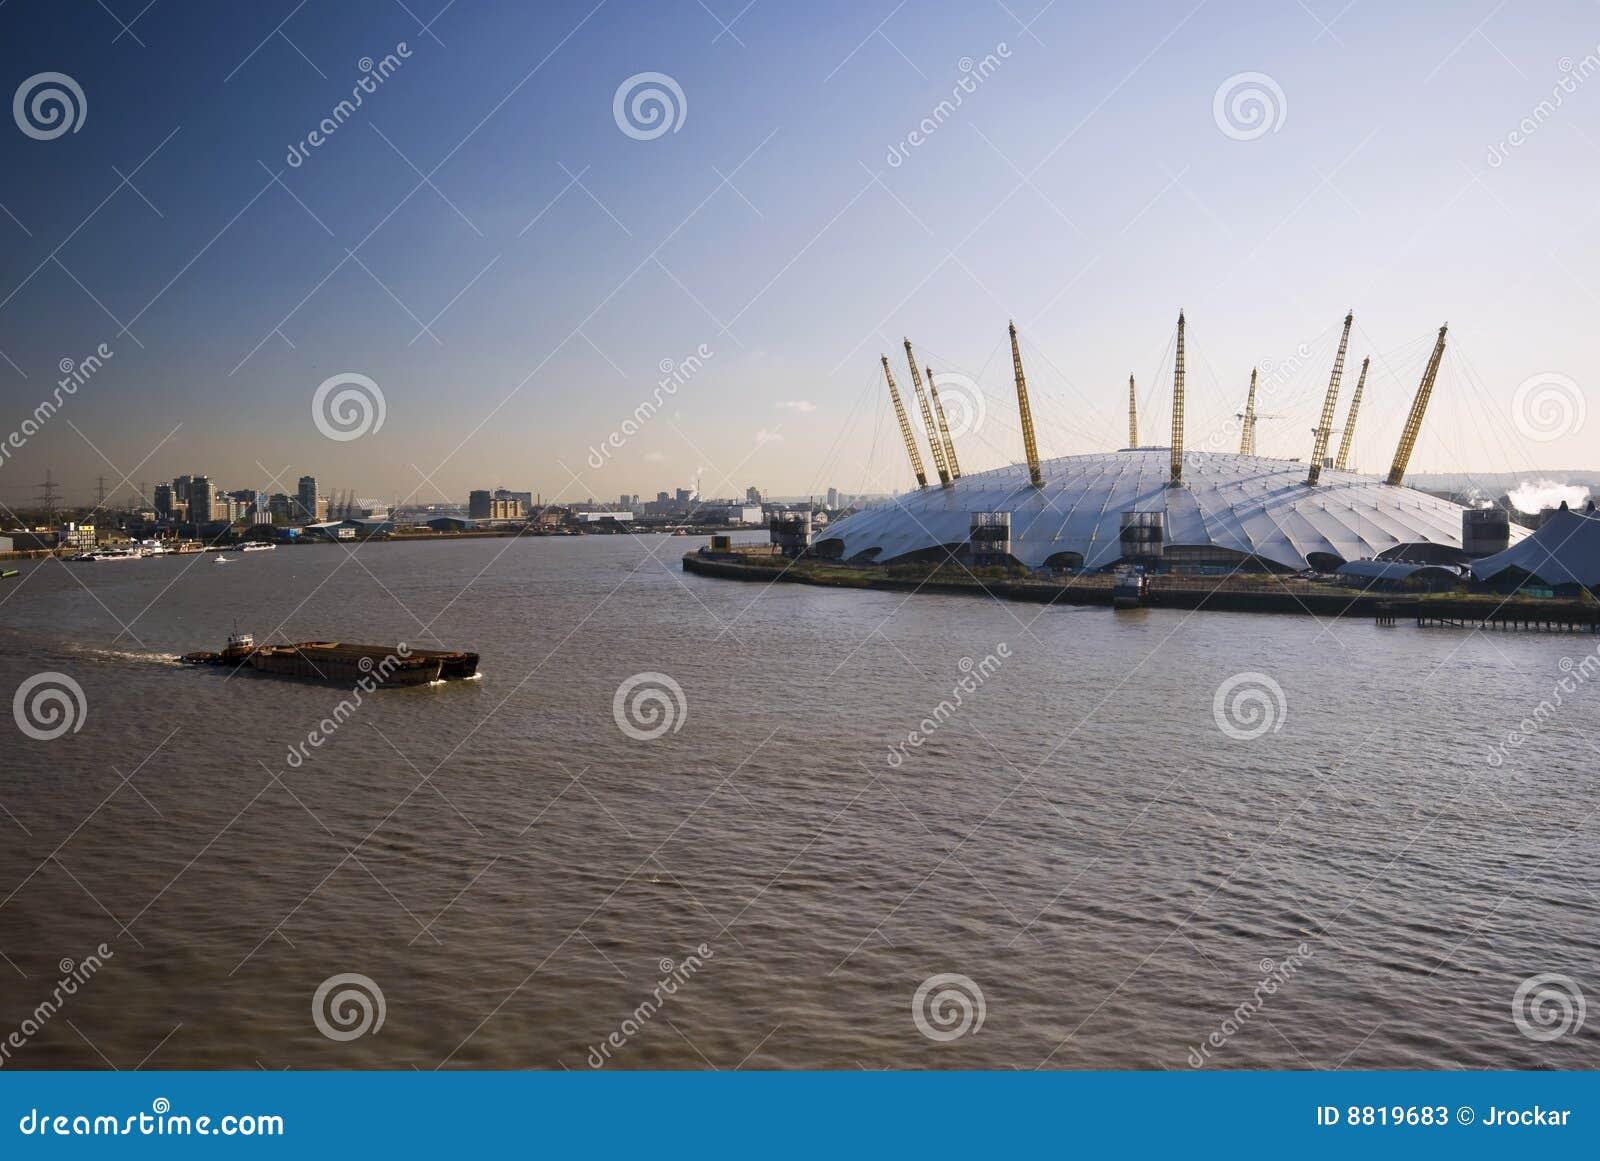 O2 arena and river thames